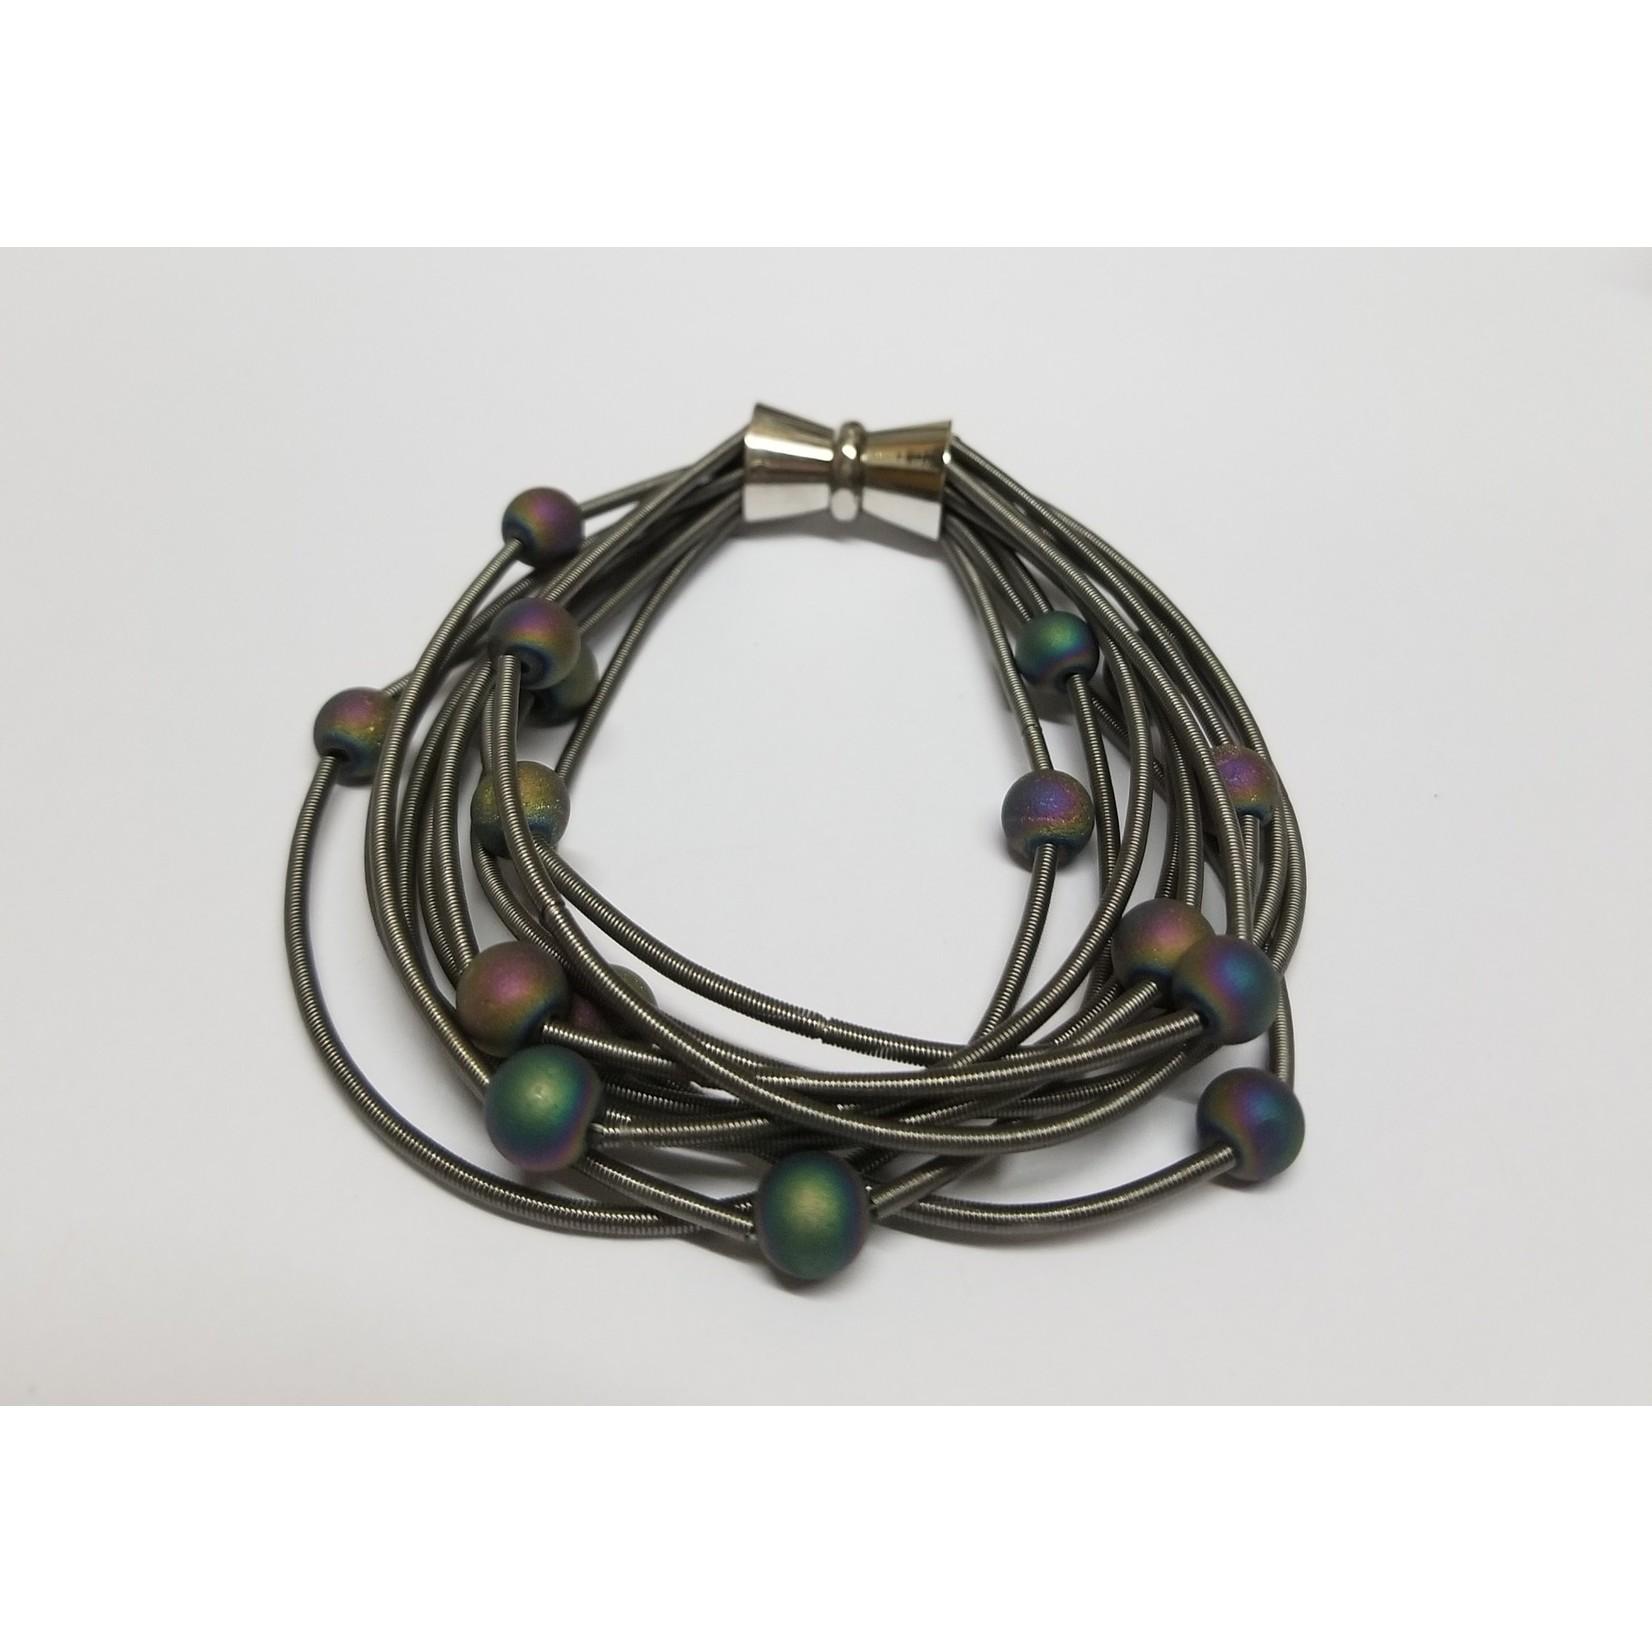 Sea Lily Slate PW 10 Layer Bracelet w/ Iridescent Geodes